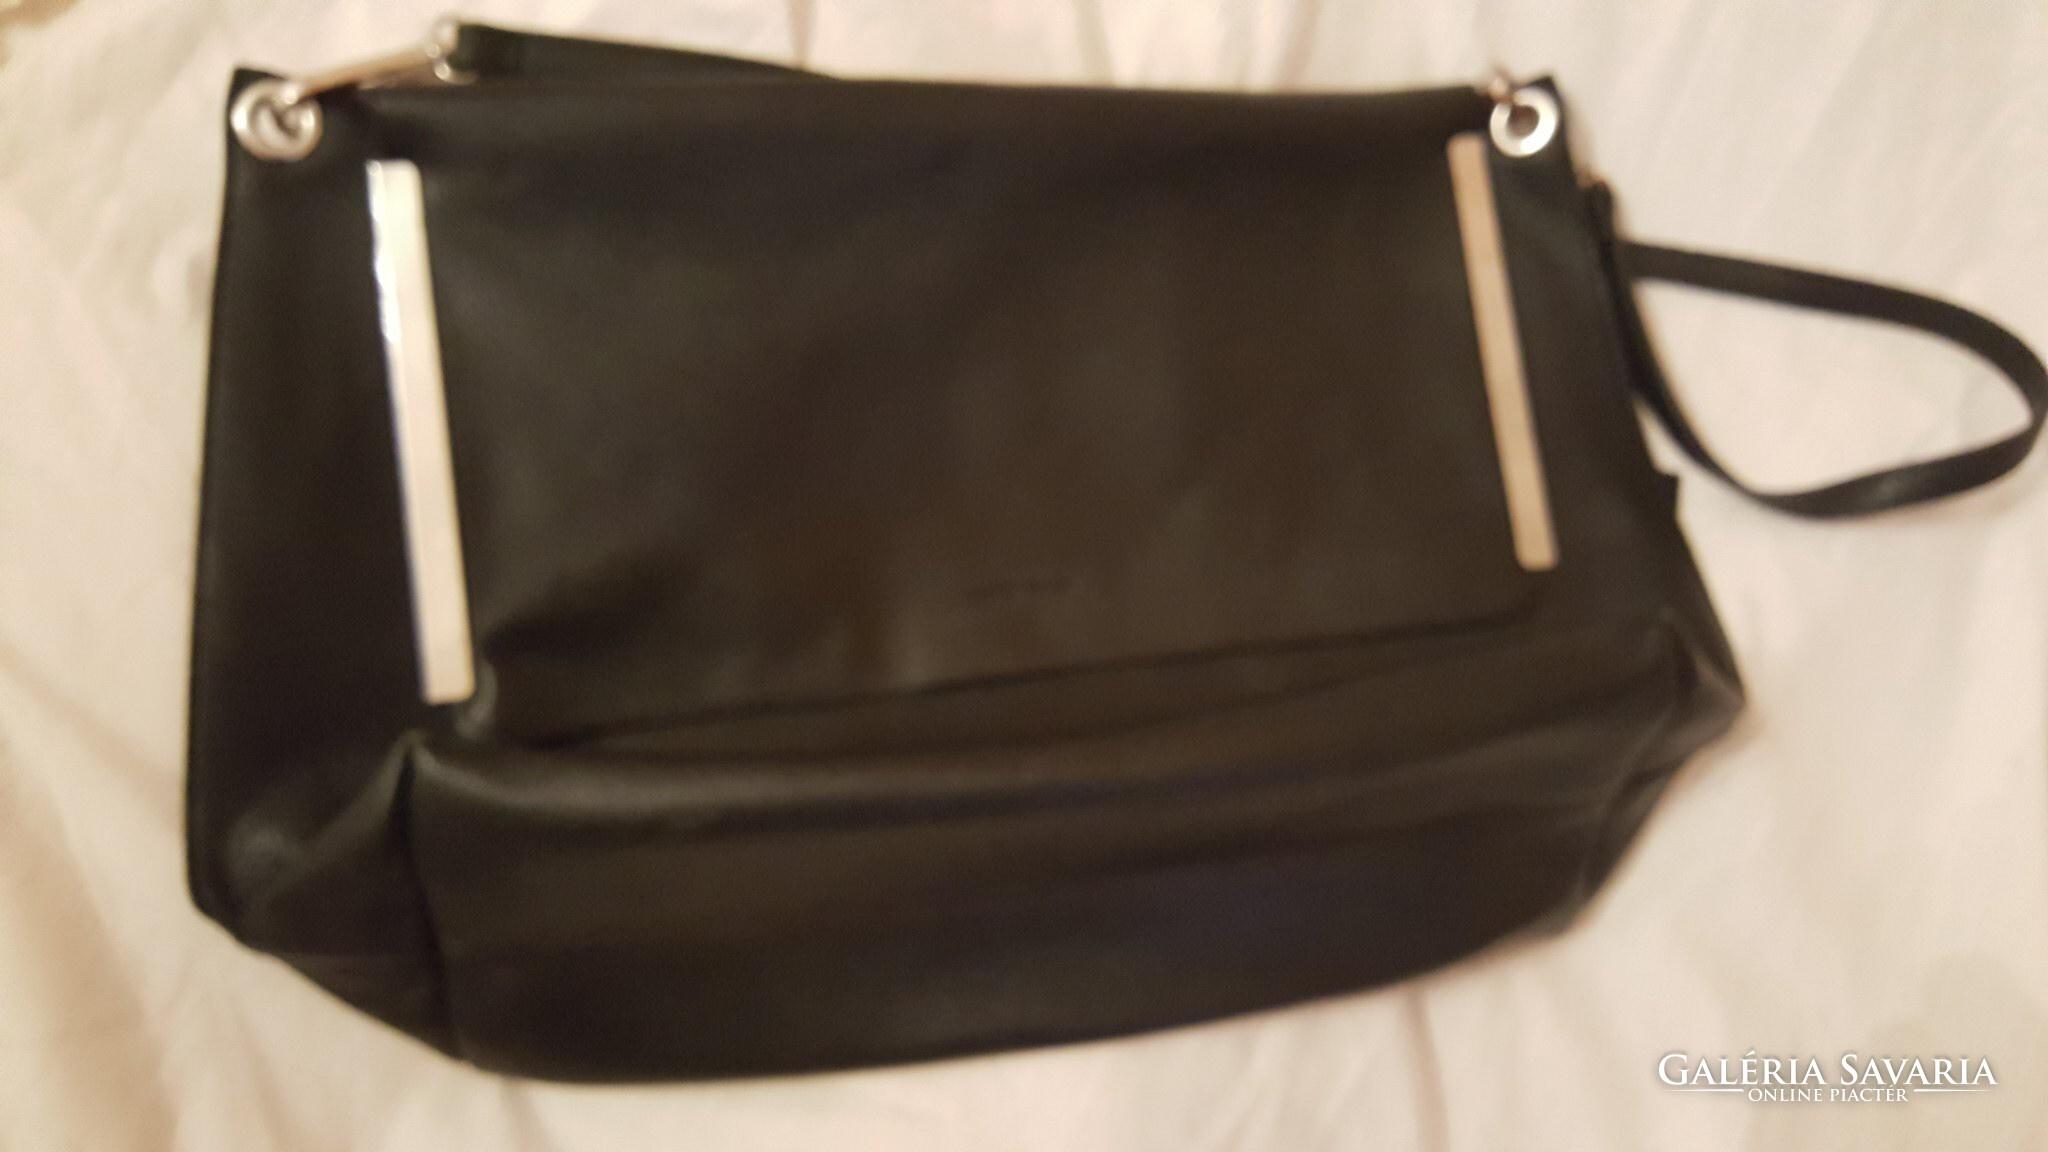 3c99b713a2f8 MANGO márkajú bőr táska - Gardrób | Galéria Savaria online piactér ...